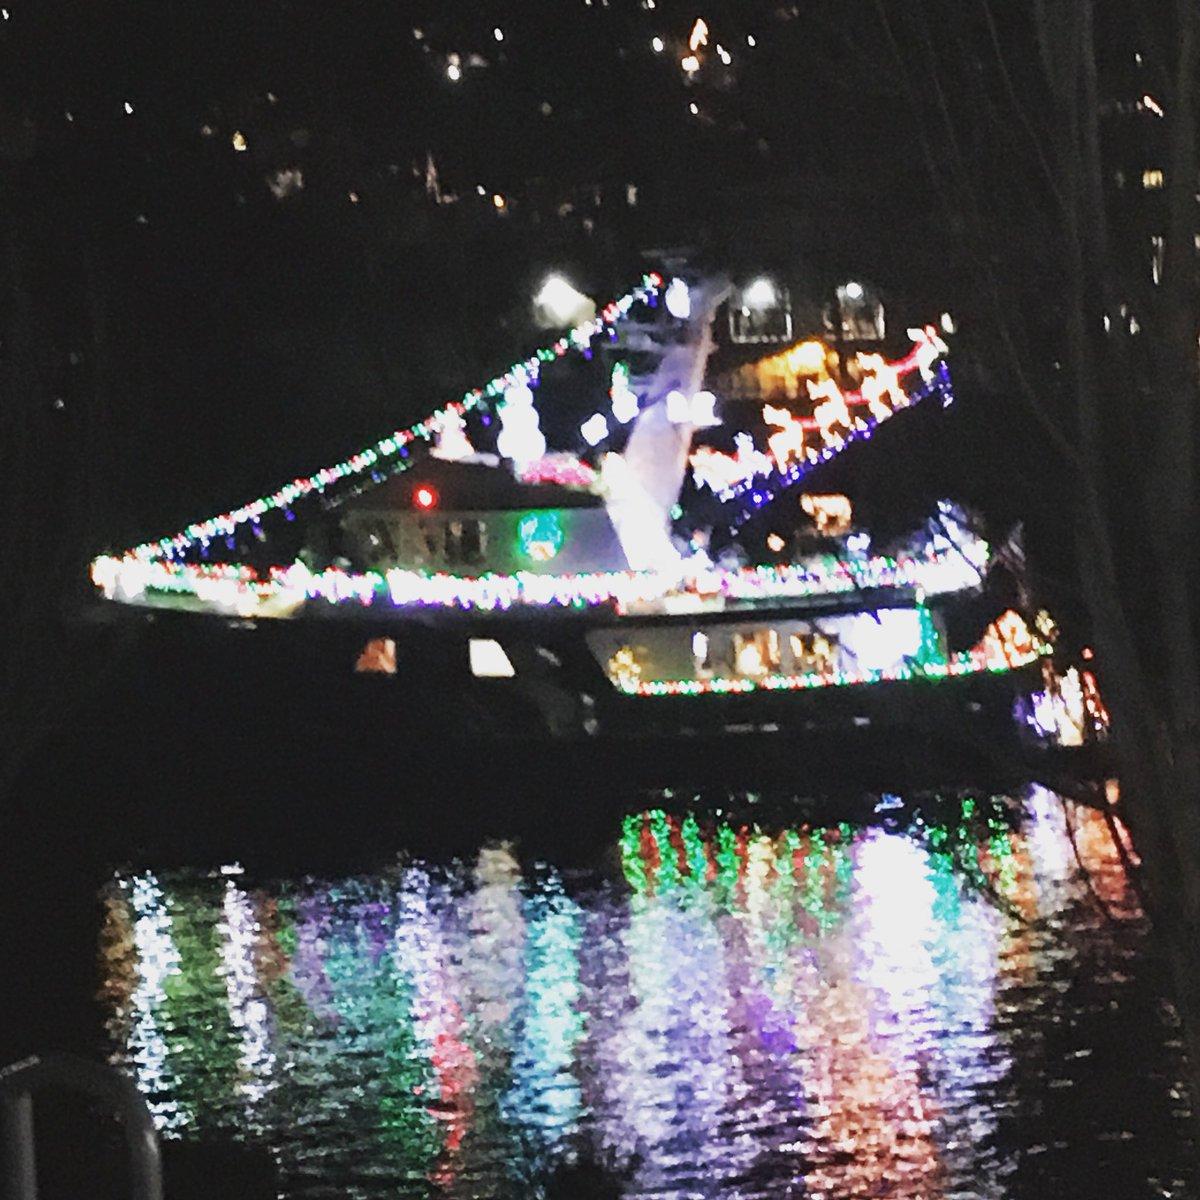 the christmas ships were amazing paradeofboats argosycruises warm1069christmas httpstcot2v626lyxd